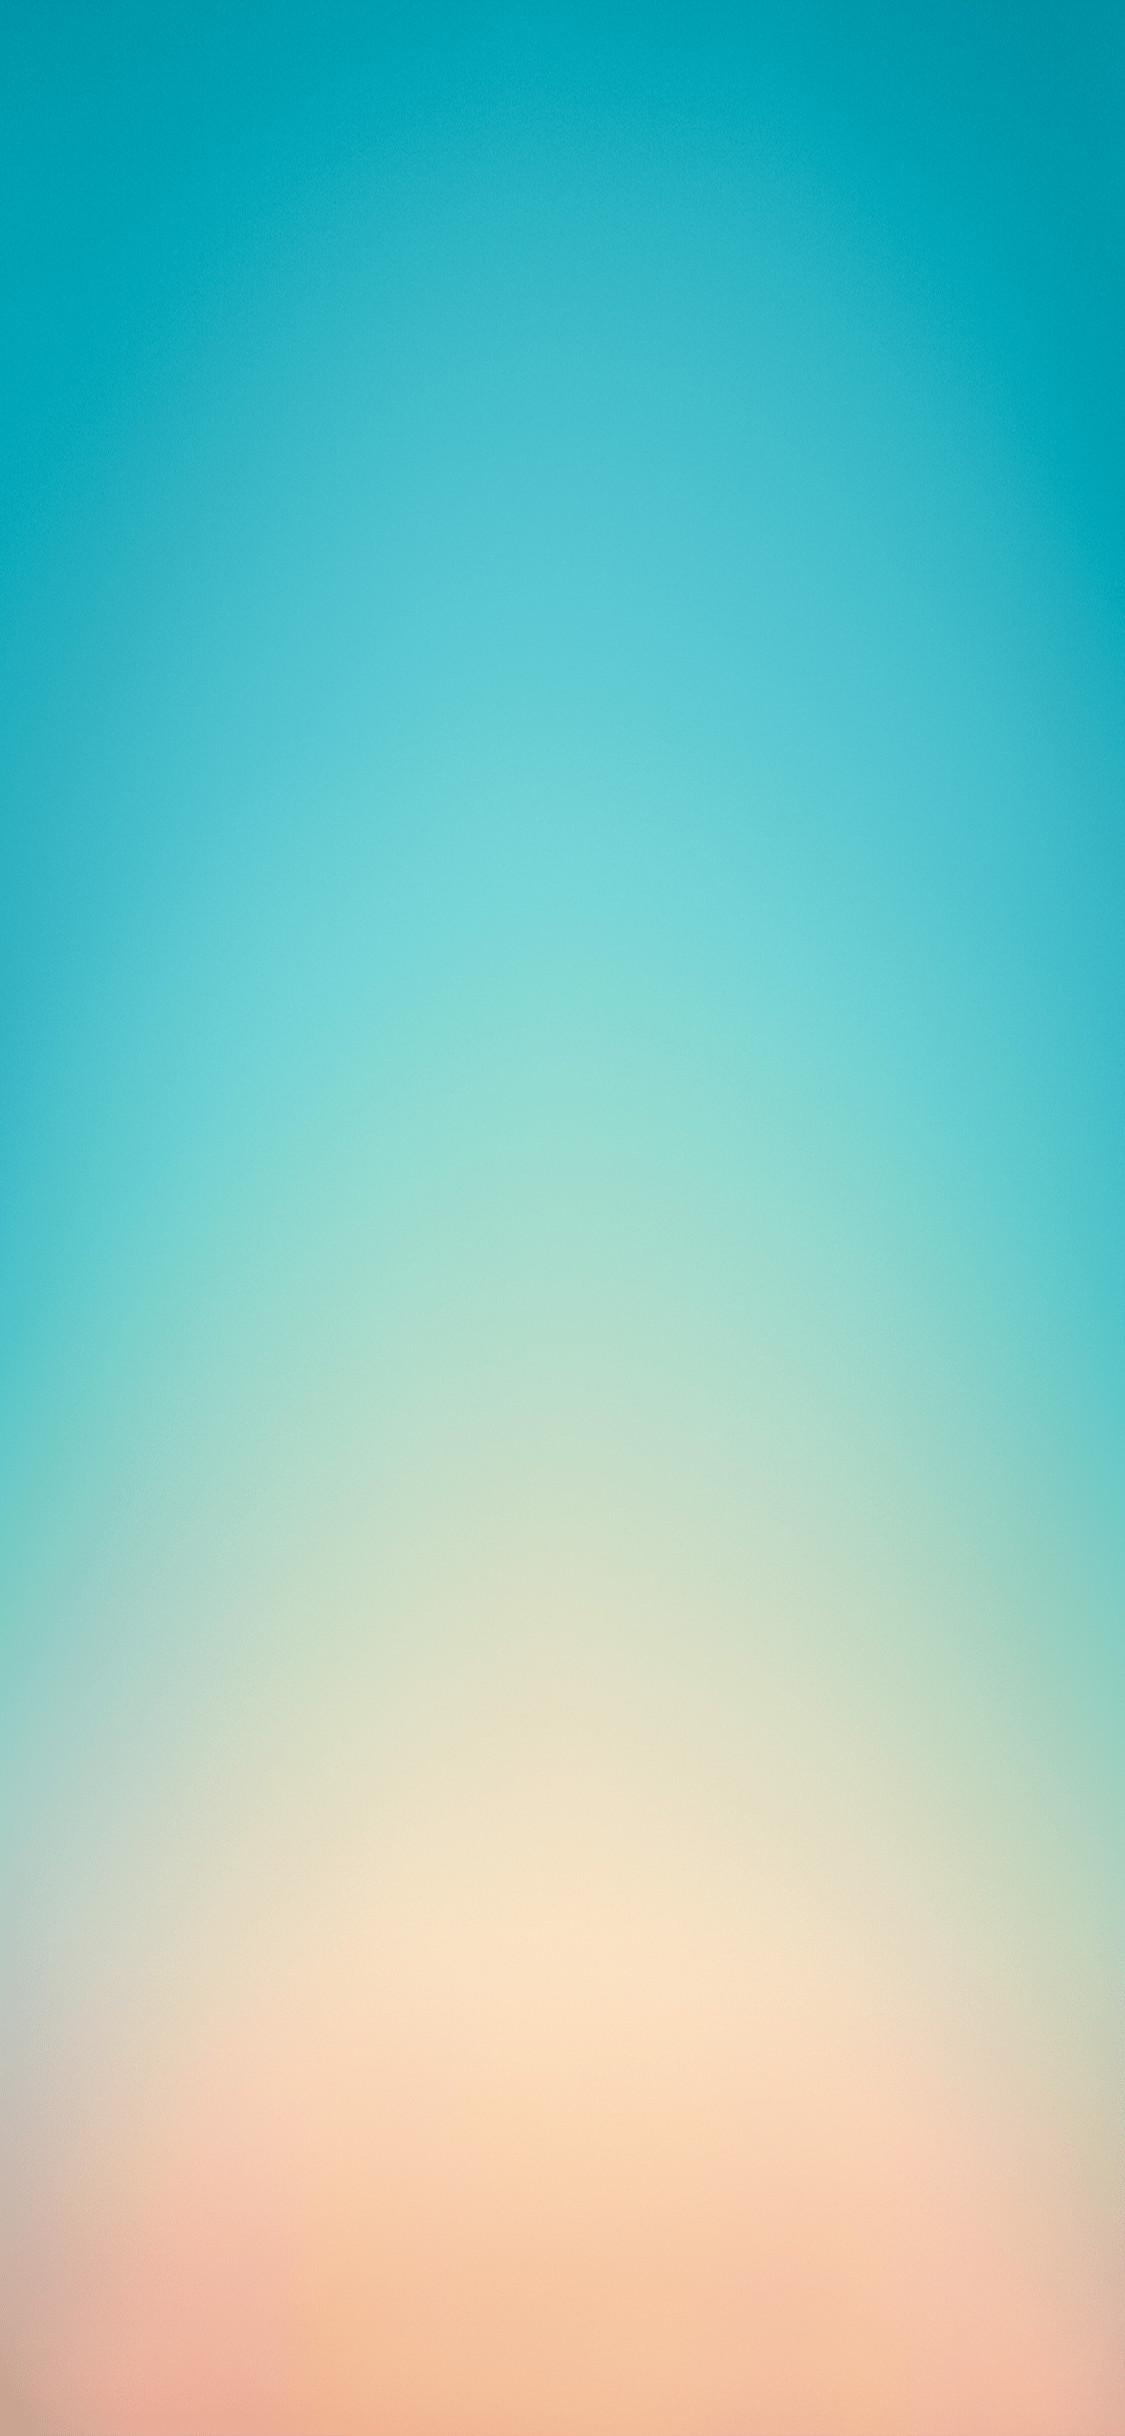 Iphone Wallpaper Stills 77 Images